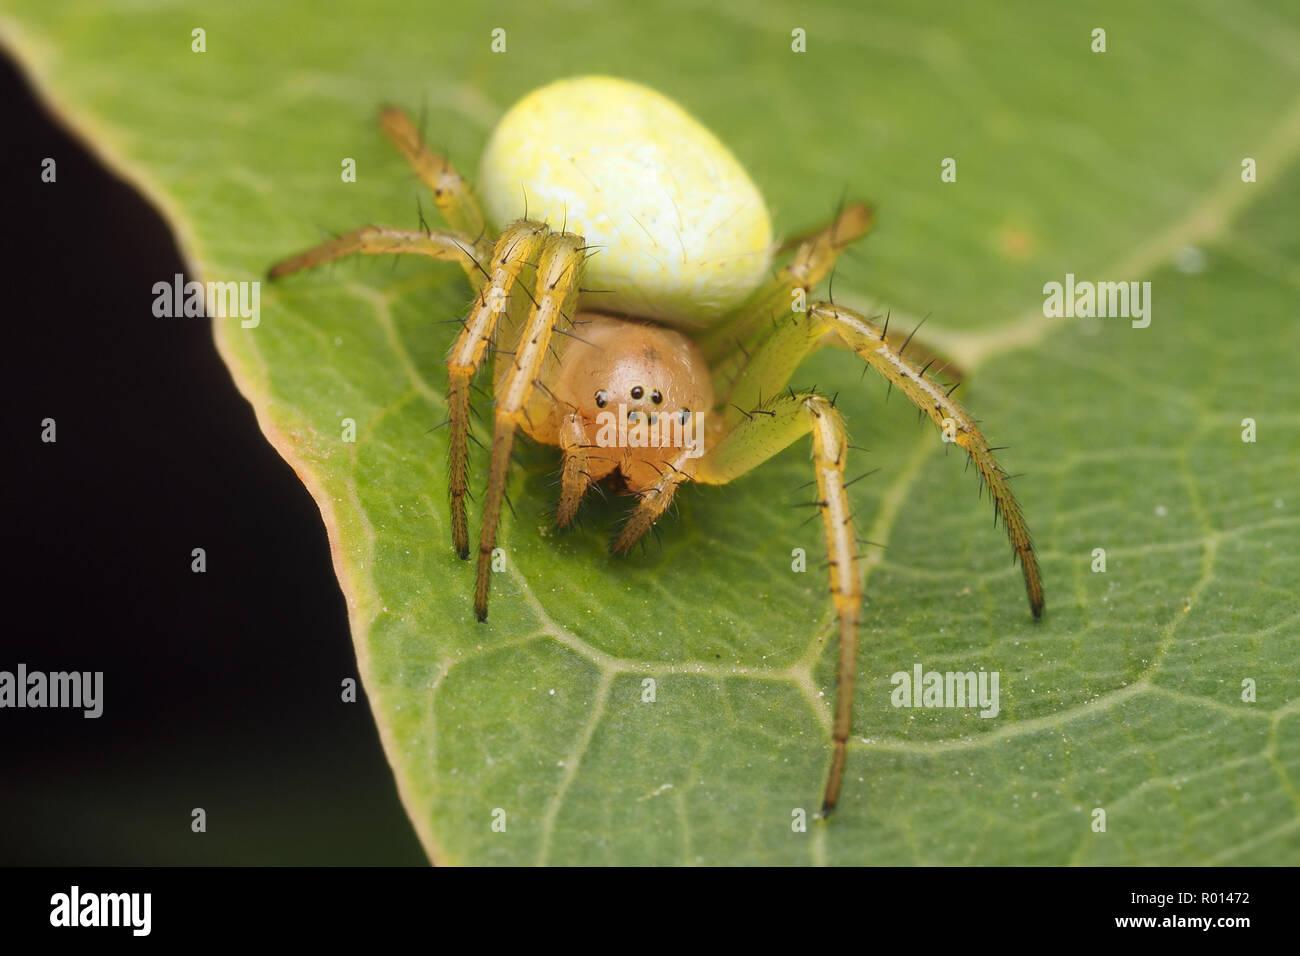 Araniella sp spider aka Cucumber Green spider sitting on leaf. Tipperary, Ireland - Stock Image